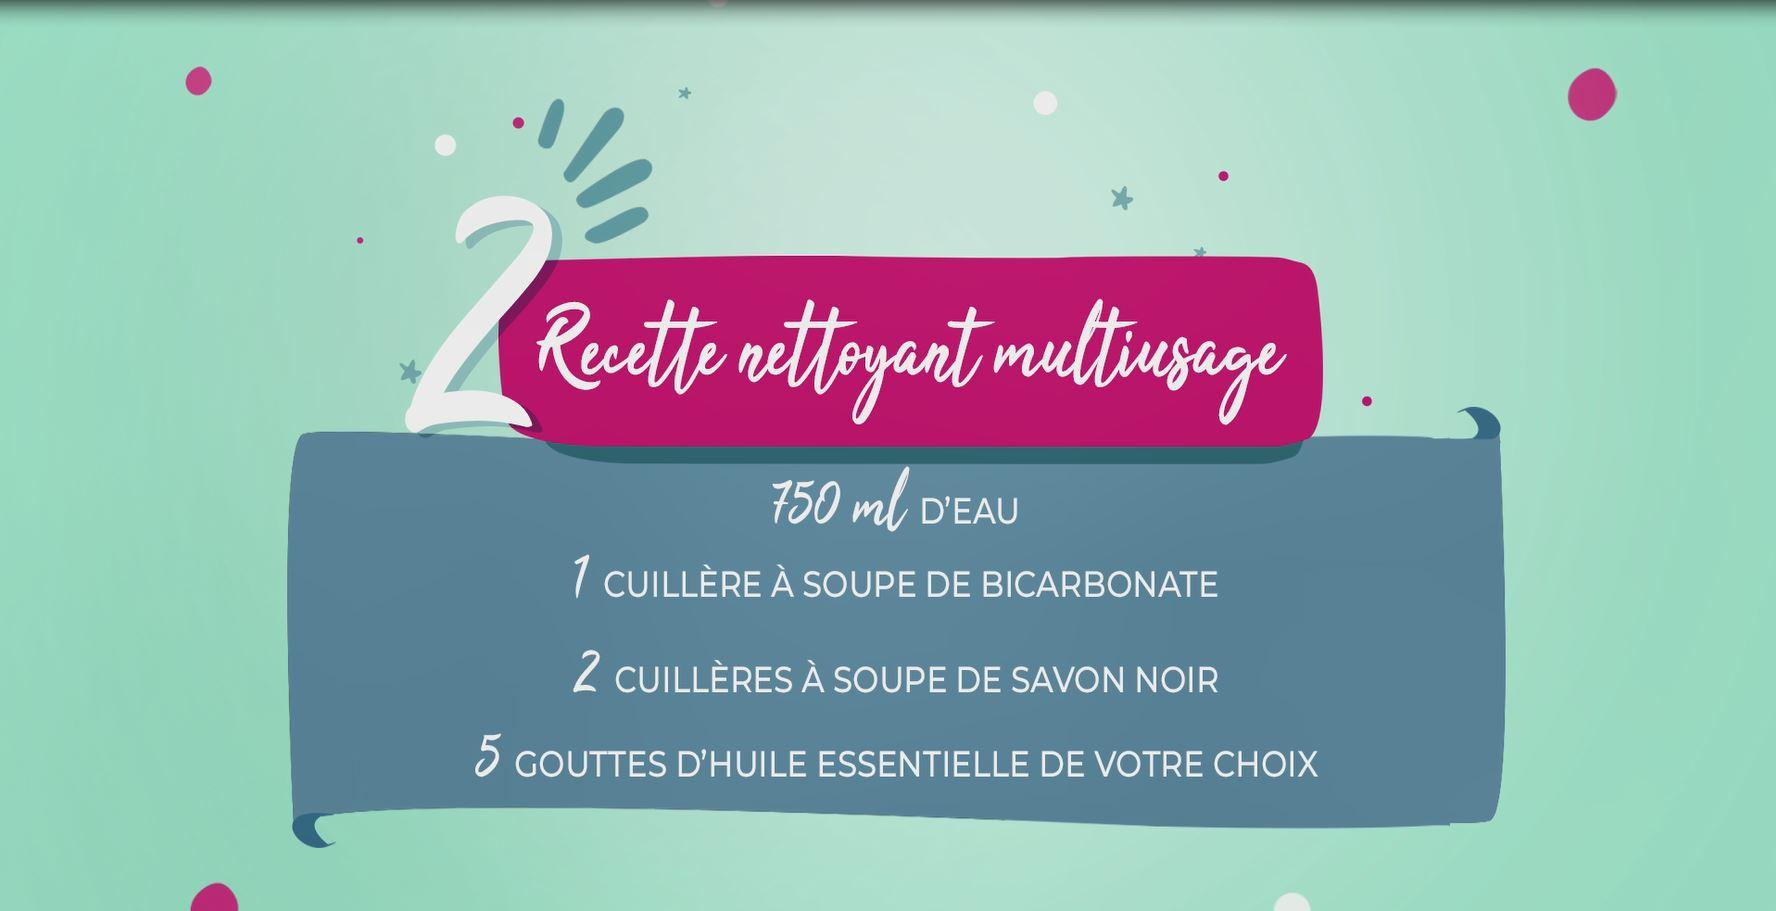 diy recette nettoyant multiusage